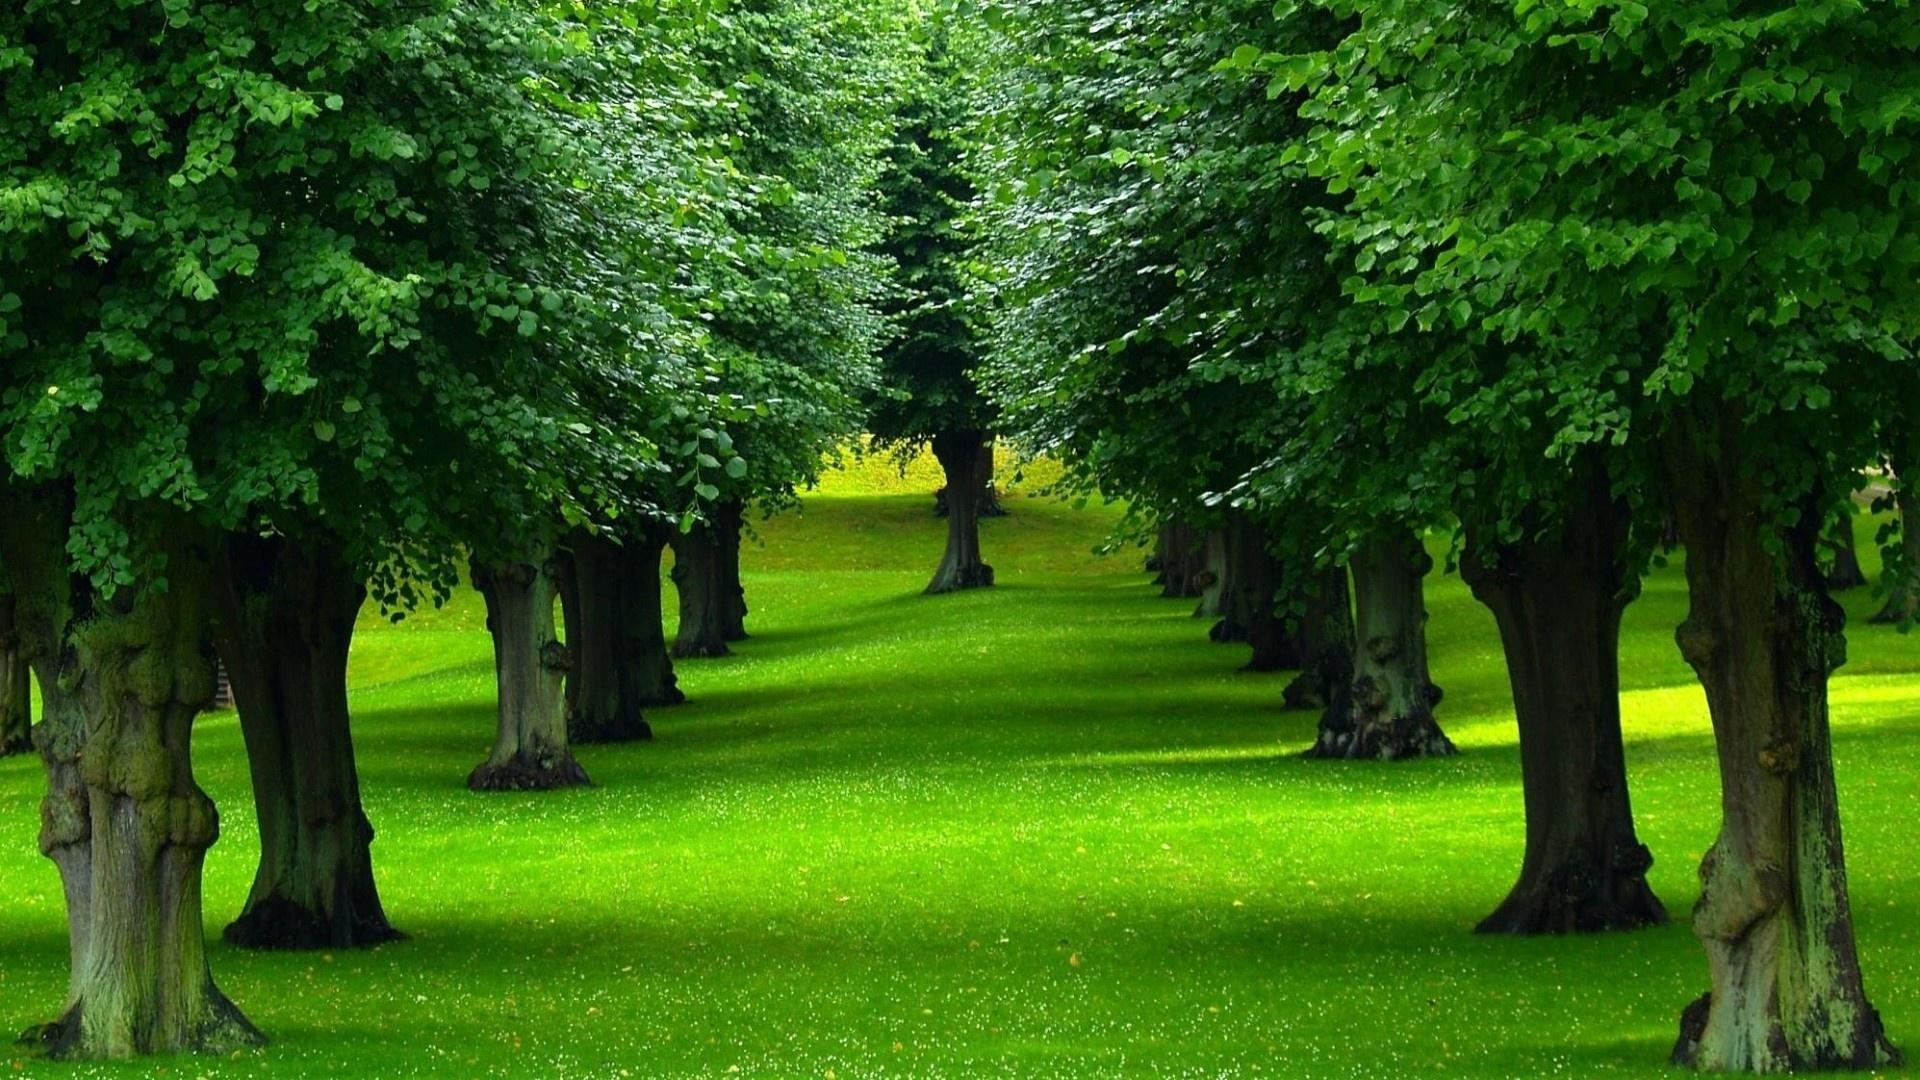 Trees Background